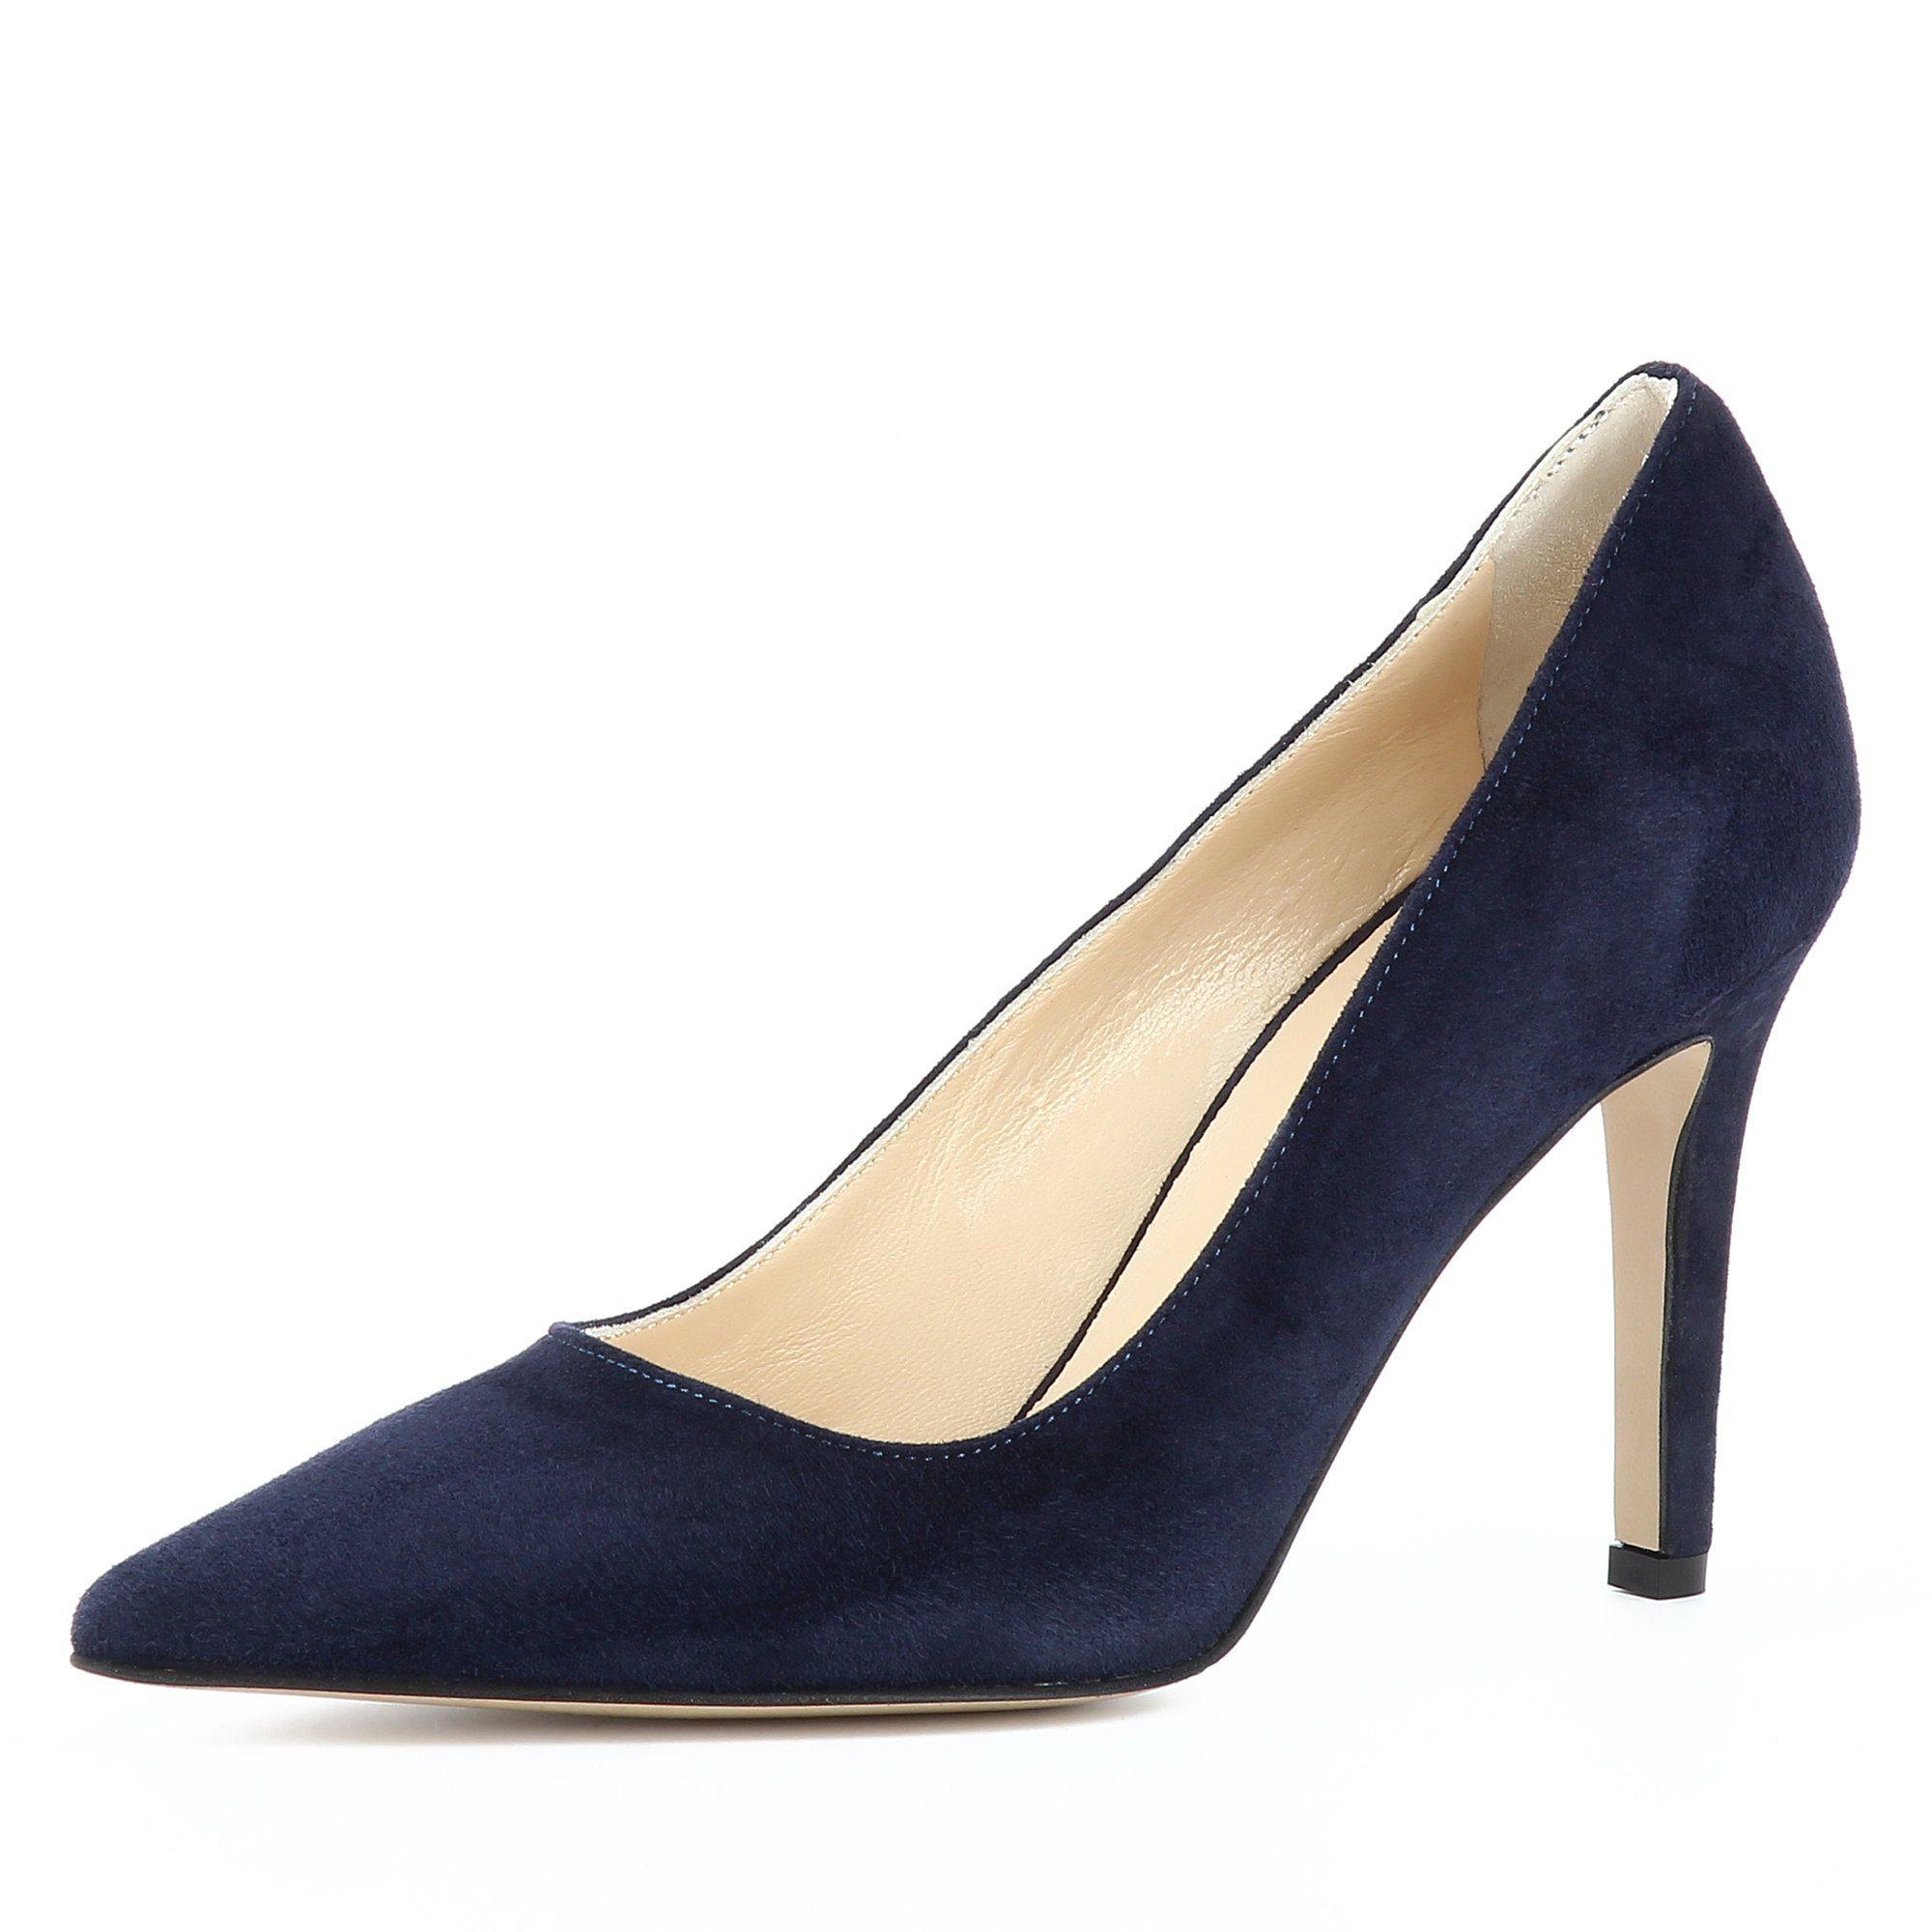 Evita NATALIA Pumps online kaufen  dunkelblau